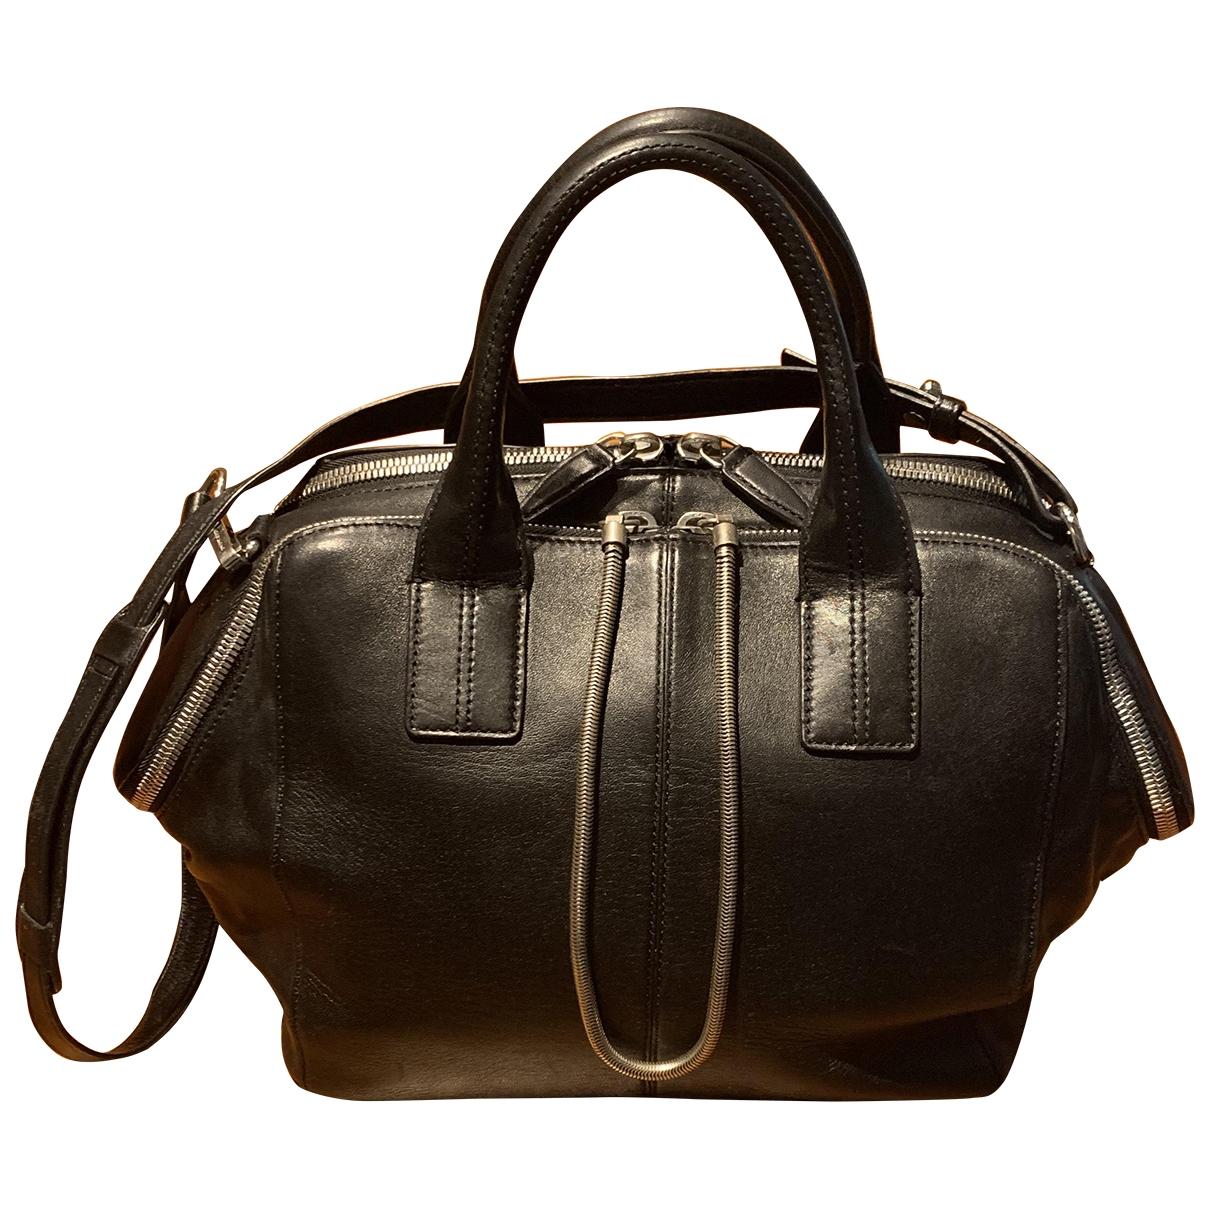 Alexander Wang \N Black Leather handbag for Women \N